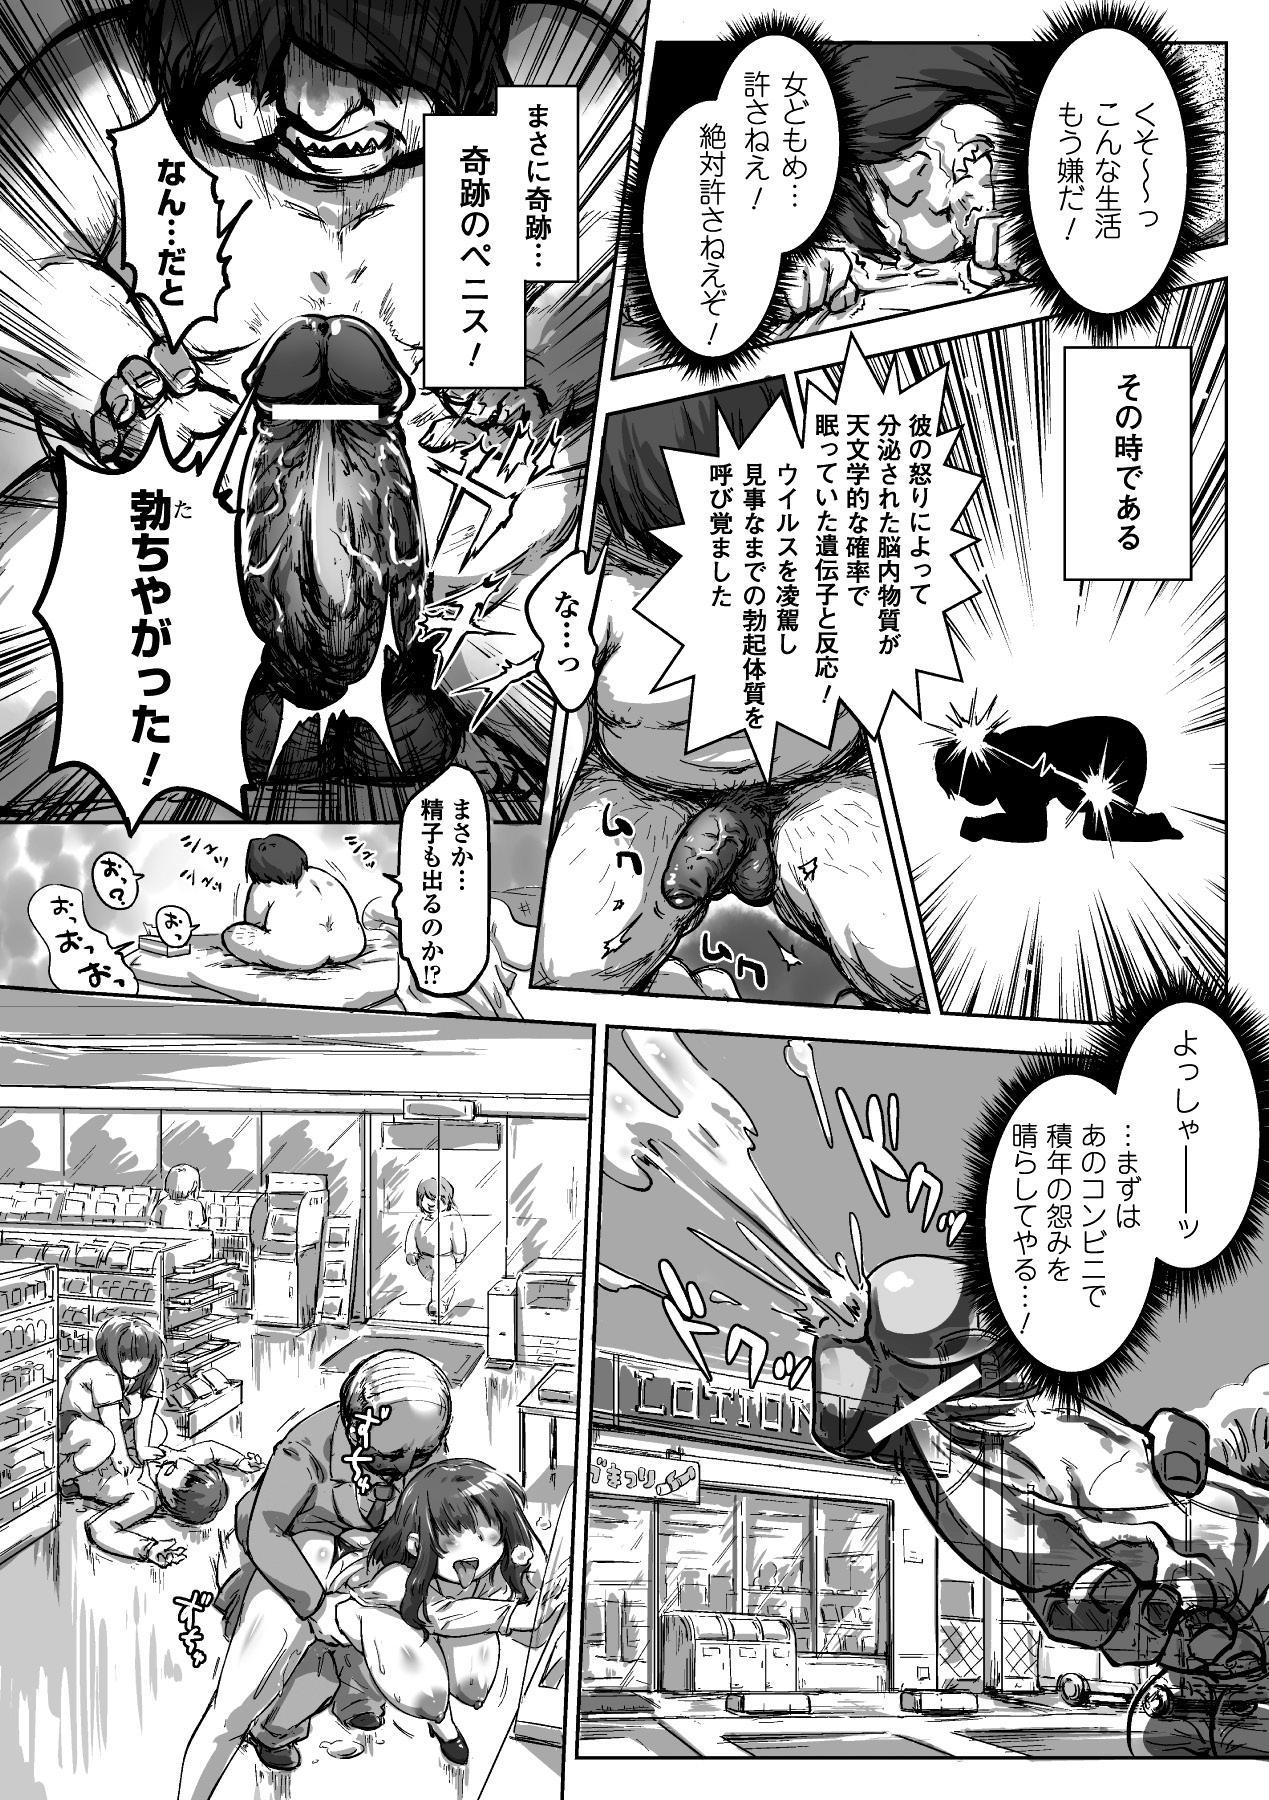 Bessatsu Comic Unreal - Joushiki ga Eroi Ijou na Sekai Vol.2 35